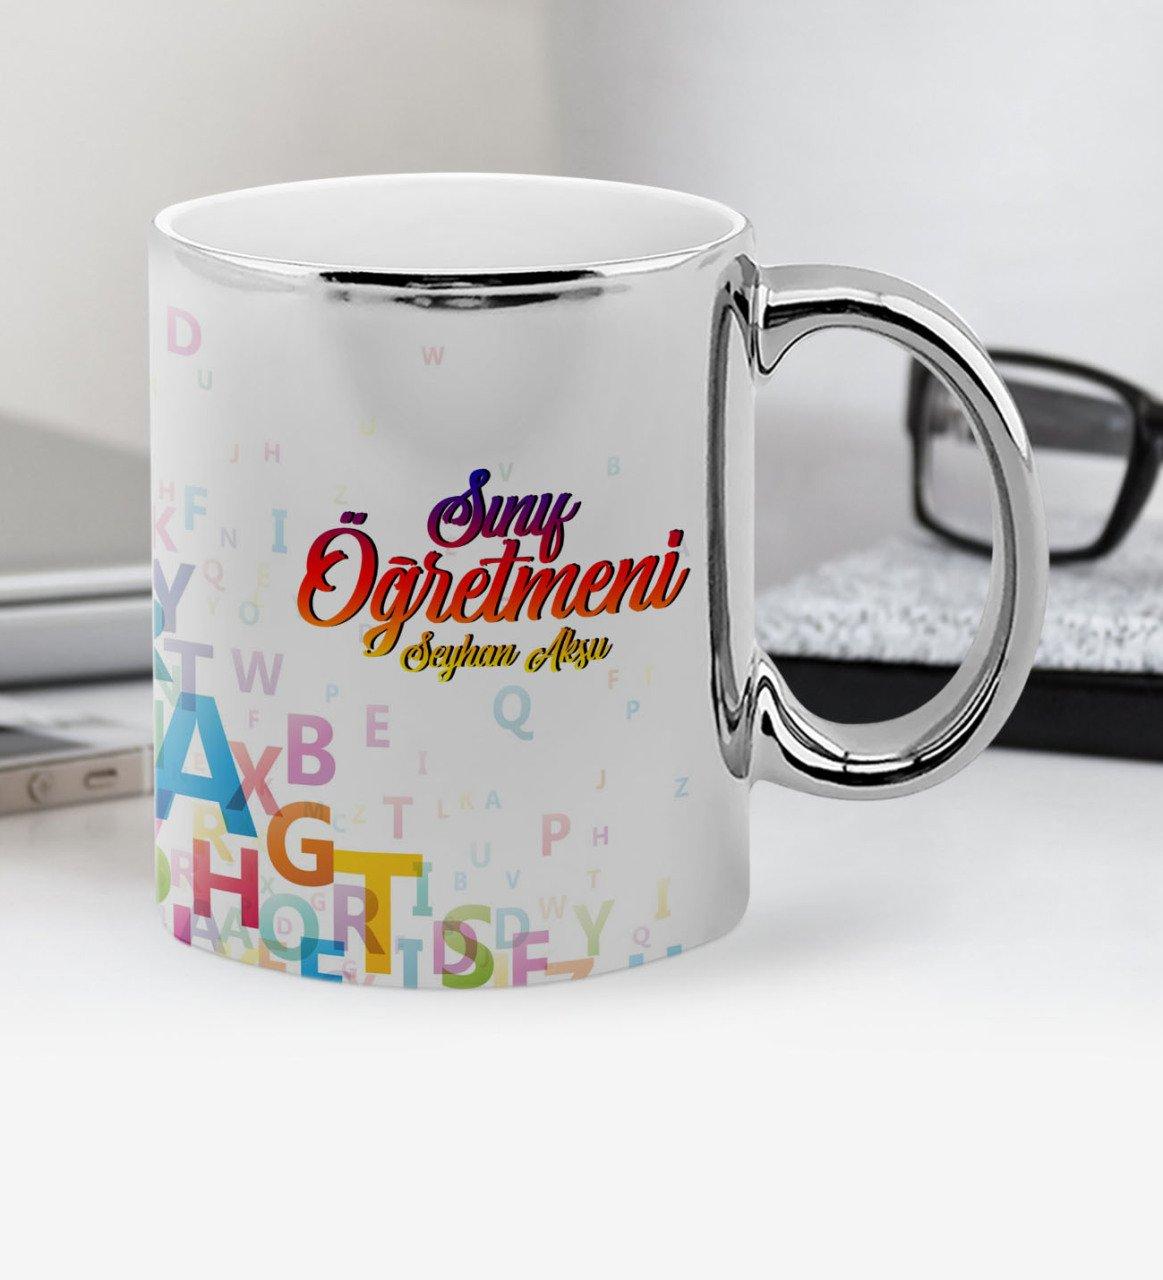 Personalized Class Teacher Chrome Mug Cup-2